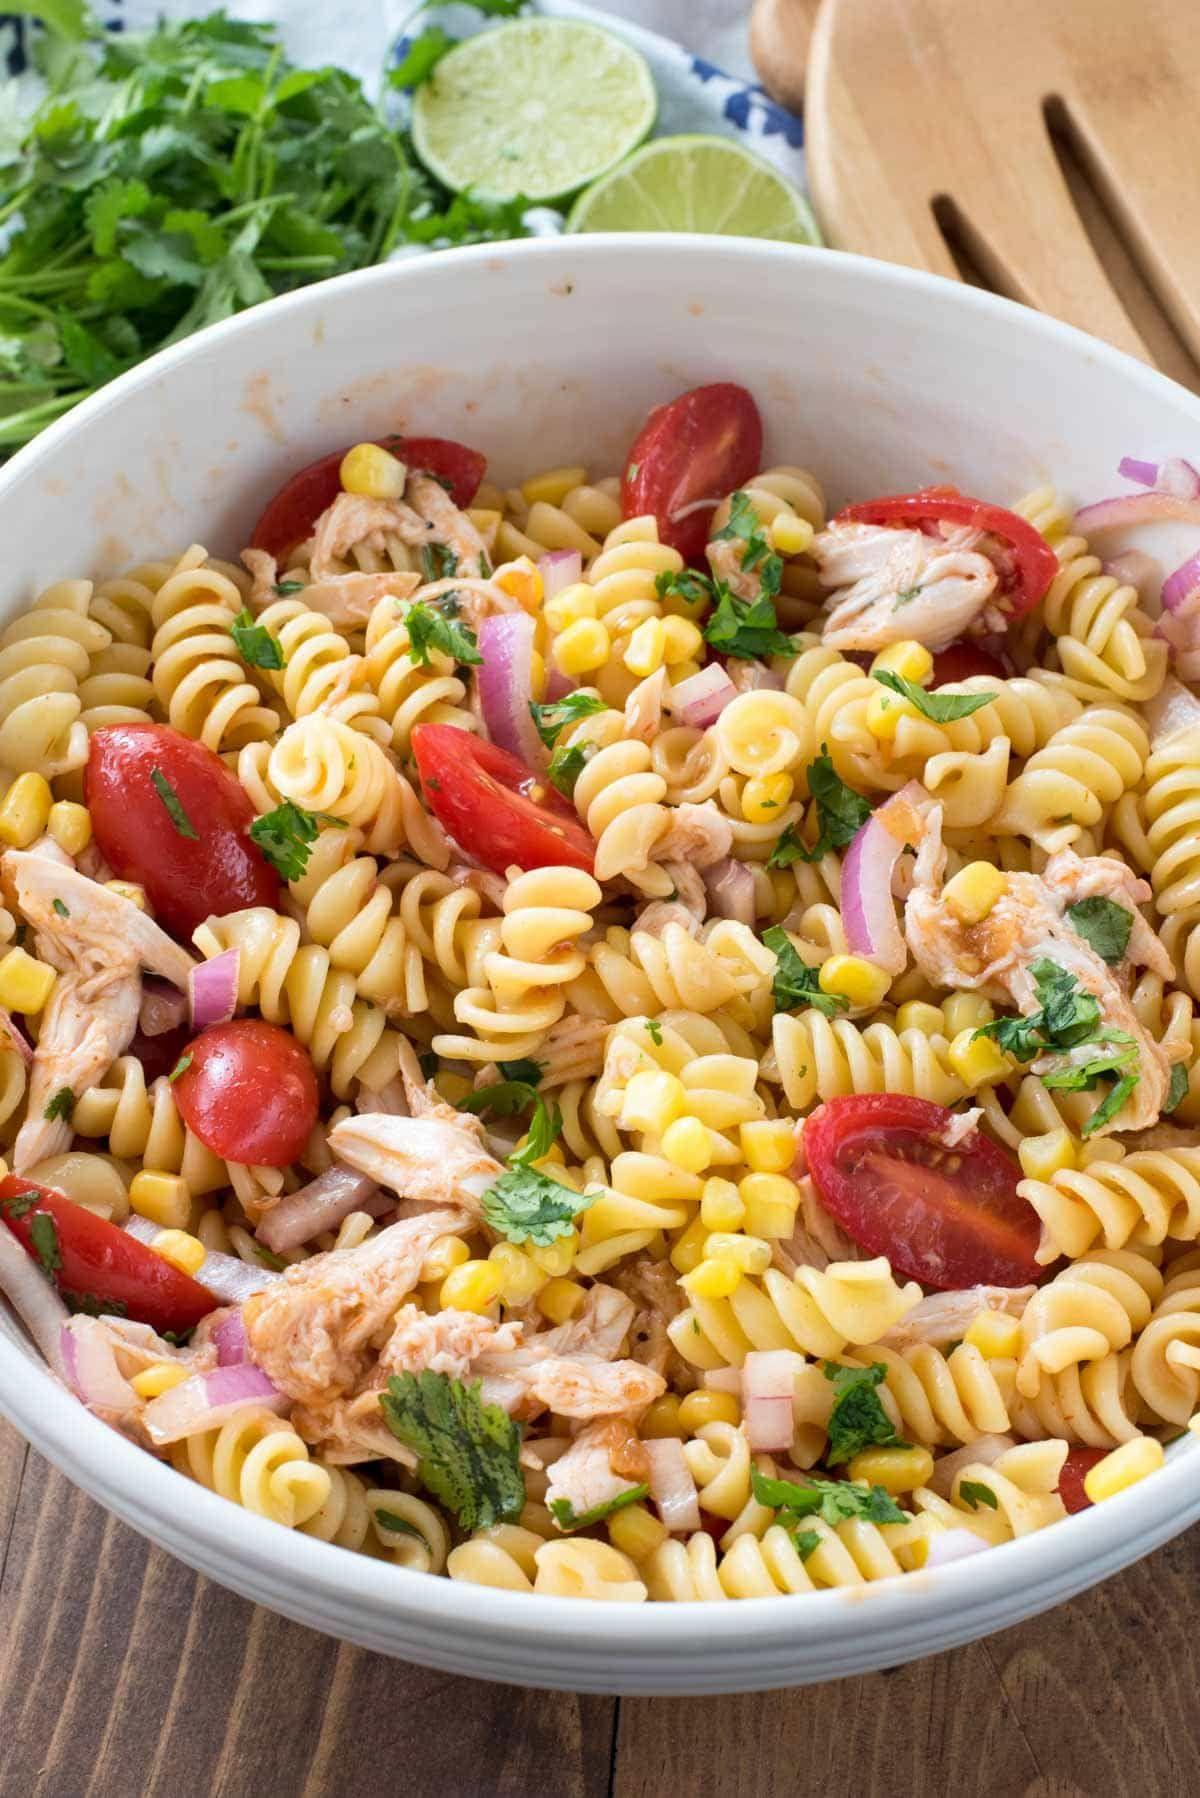 Bbq Chicken Pasta Salad Crazy For Crust Recipe Chicken Pasta Salad Recipes Bbq Chicken Pasta Pasta Salad Recipes